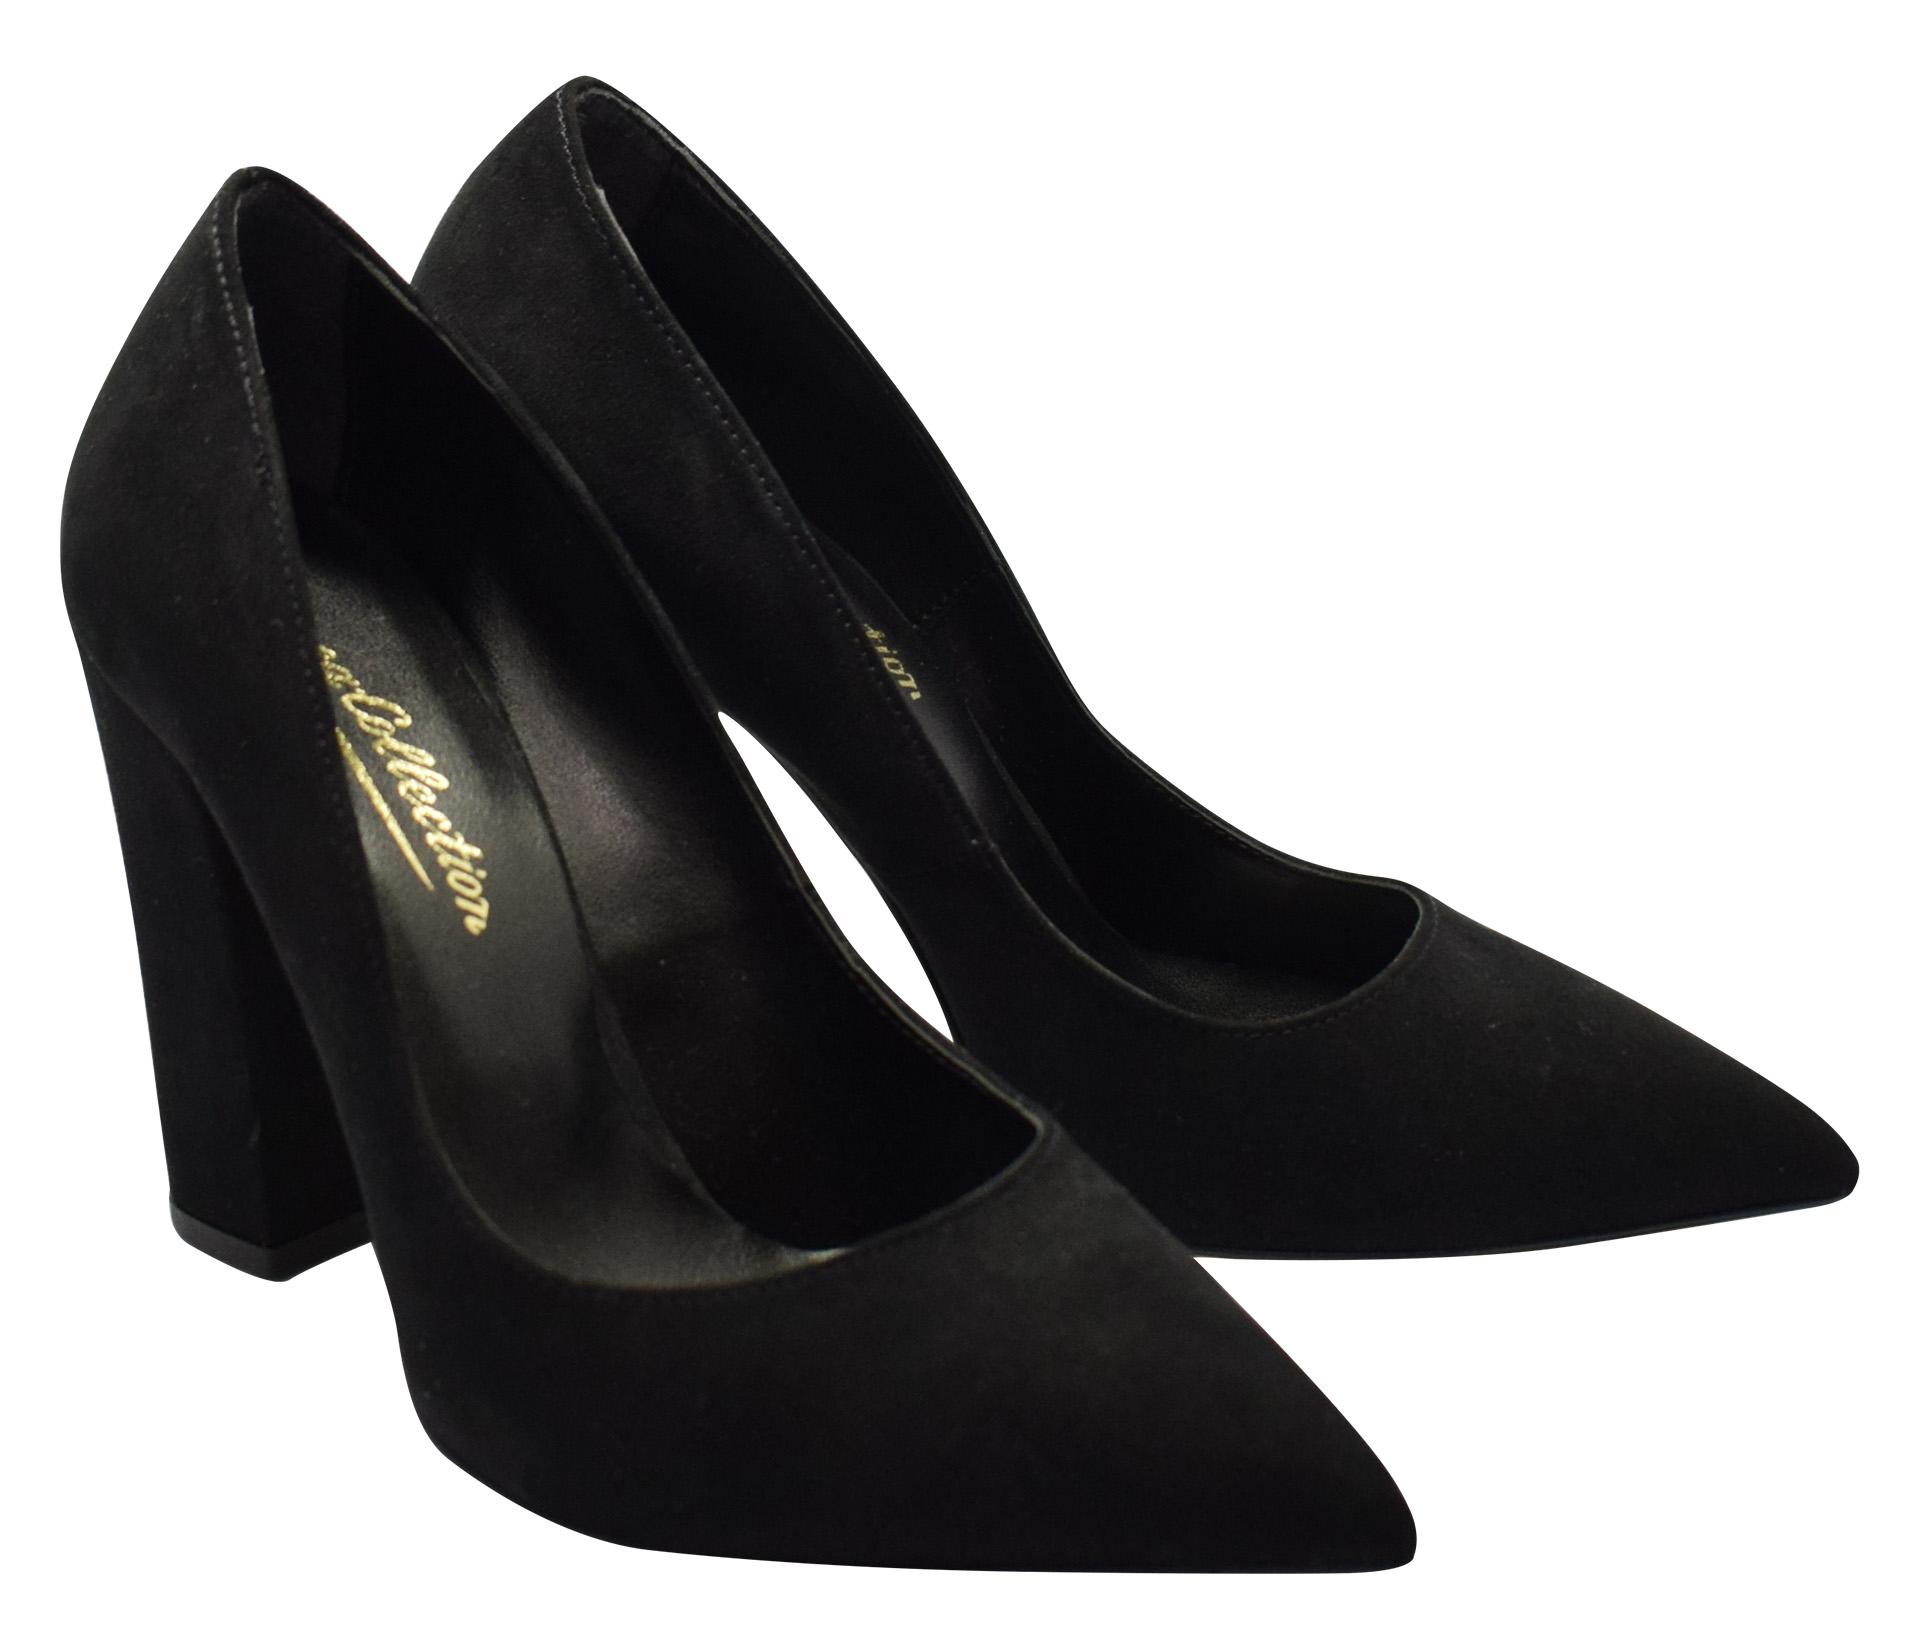 61ed04cbef0 Μαύρη Suede Μυτερή Γόβα με Χοντρό Τακούνι - Γυναικεία Παπούτσια ...